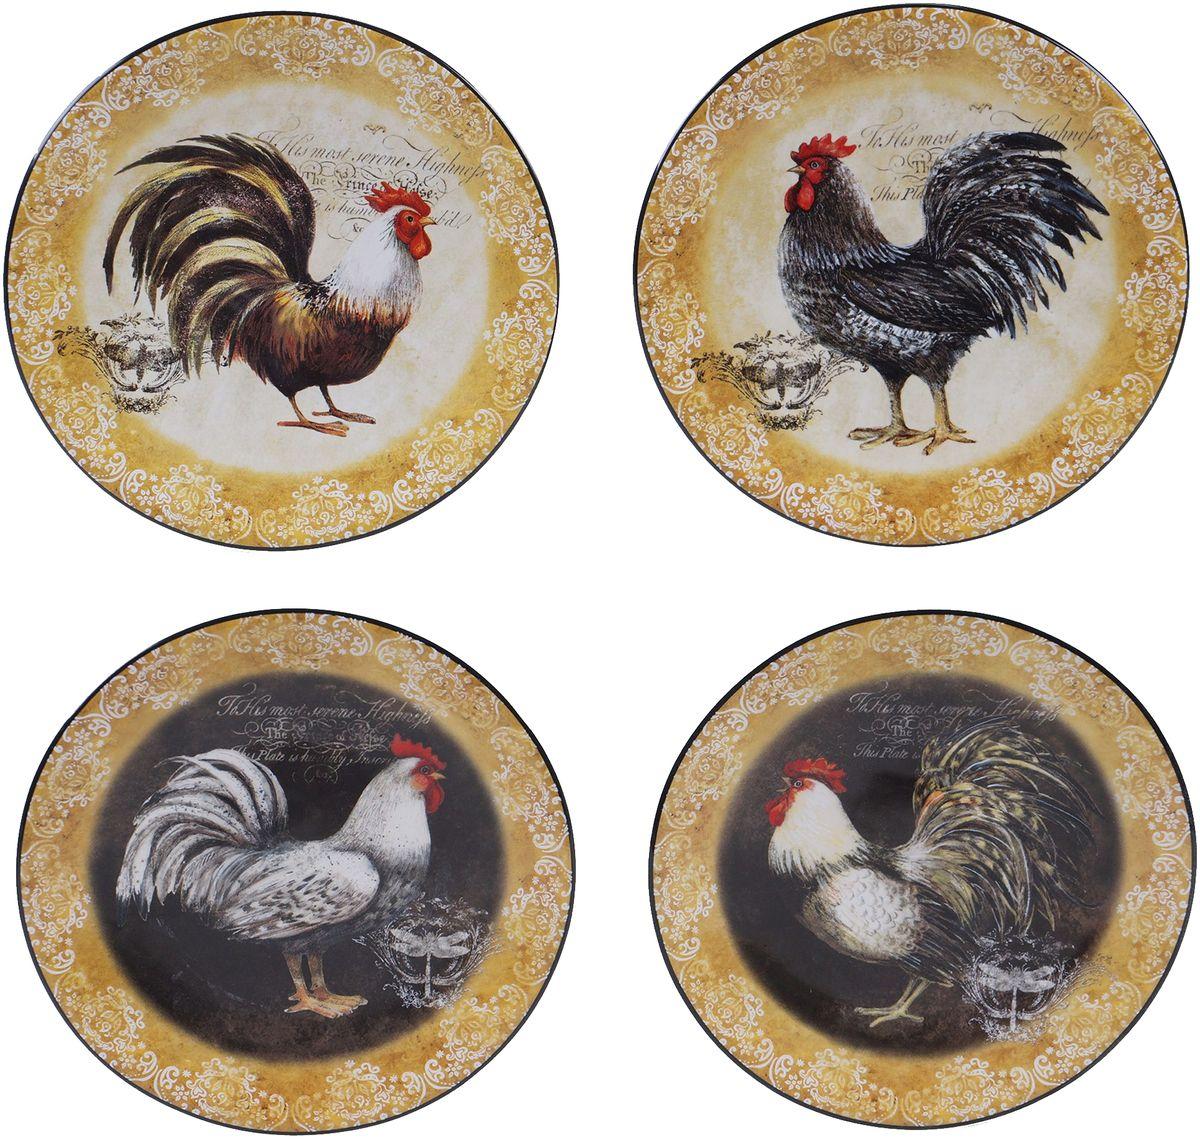 Набор тарелок Certified International Винтажный петух, диаметр 15 см, 4 шт57490/1